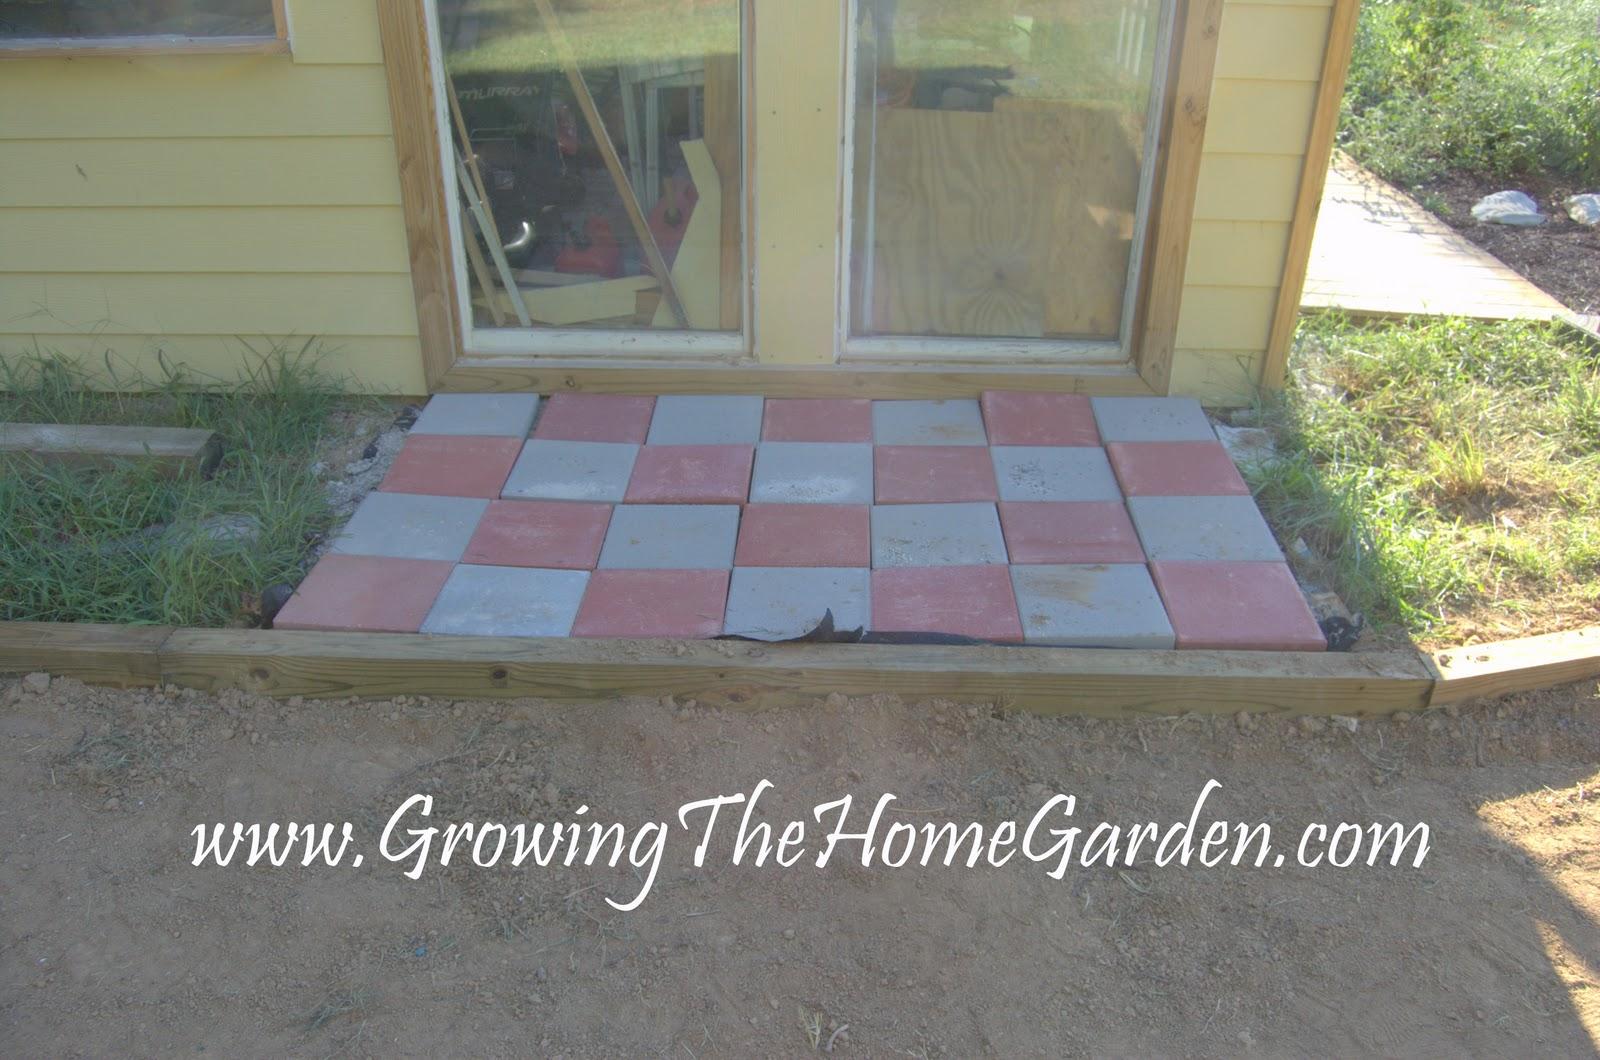 Stepping Stones in the Garden - Growing The Home Garden